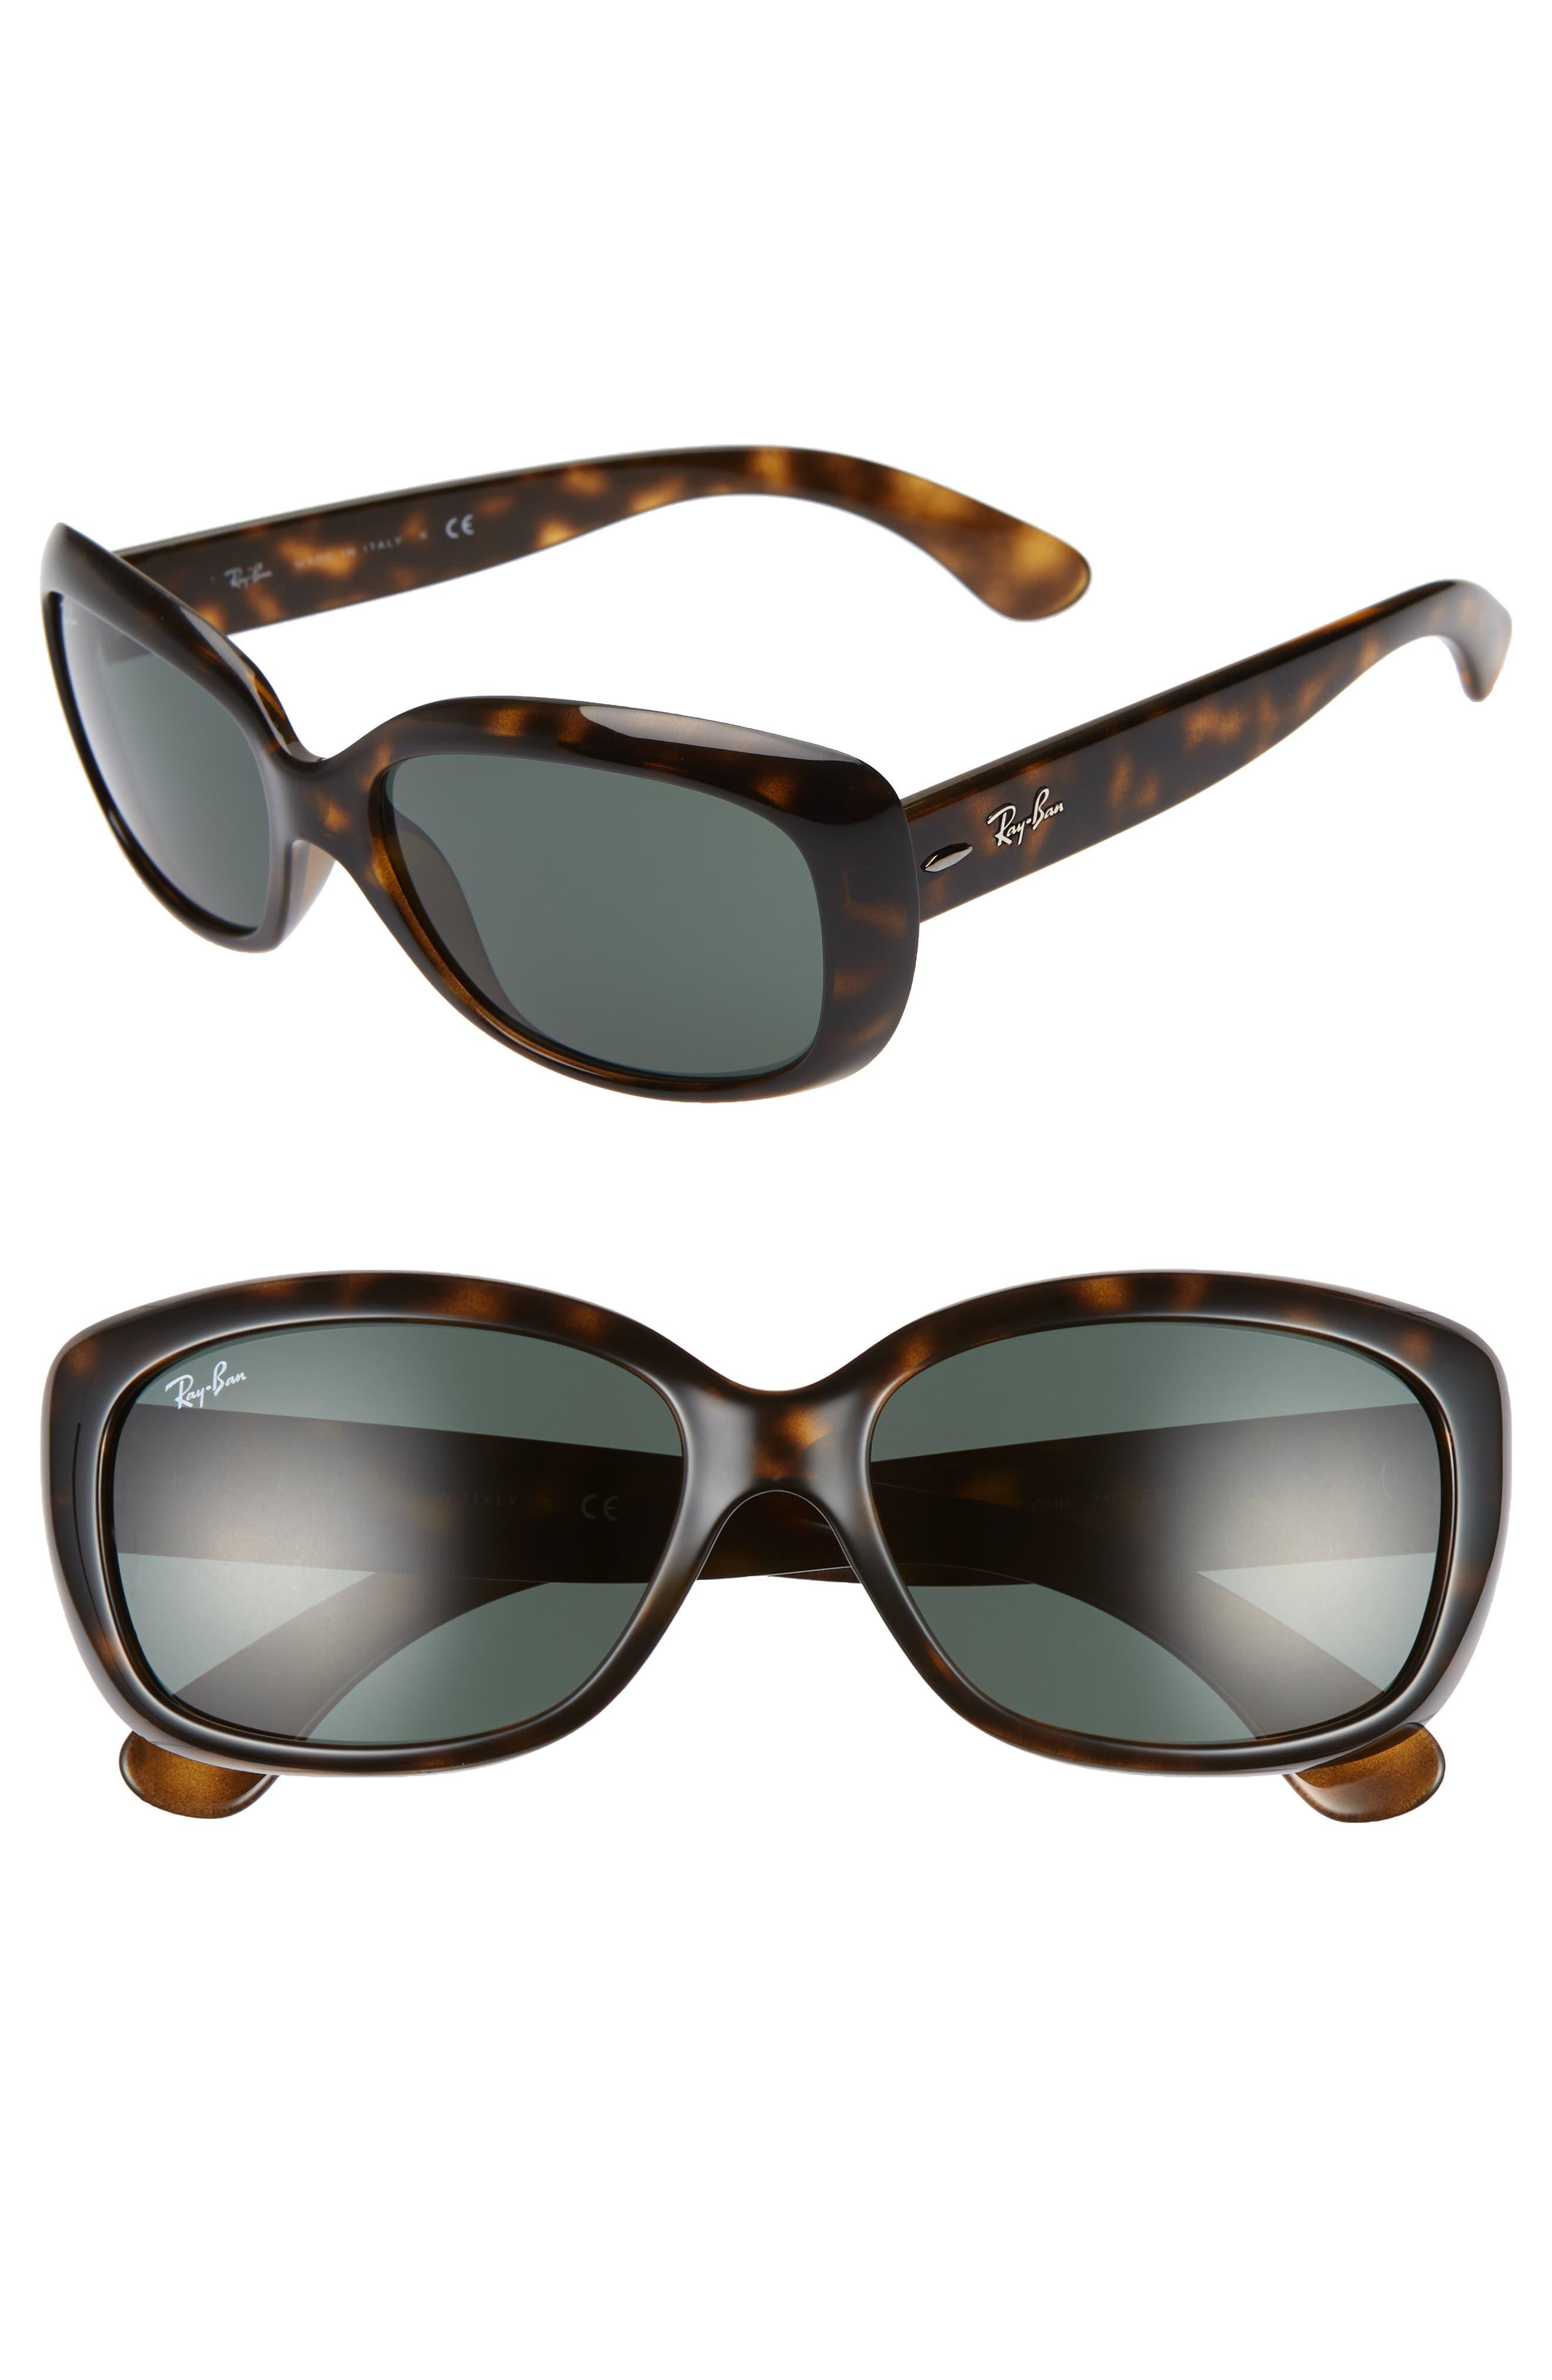 Ray-Ban Jackie Ohh 5m Cat Eye Sunglasses - Lite Havana/ Green Solid